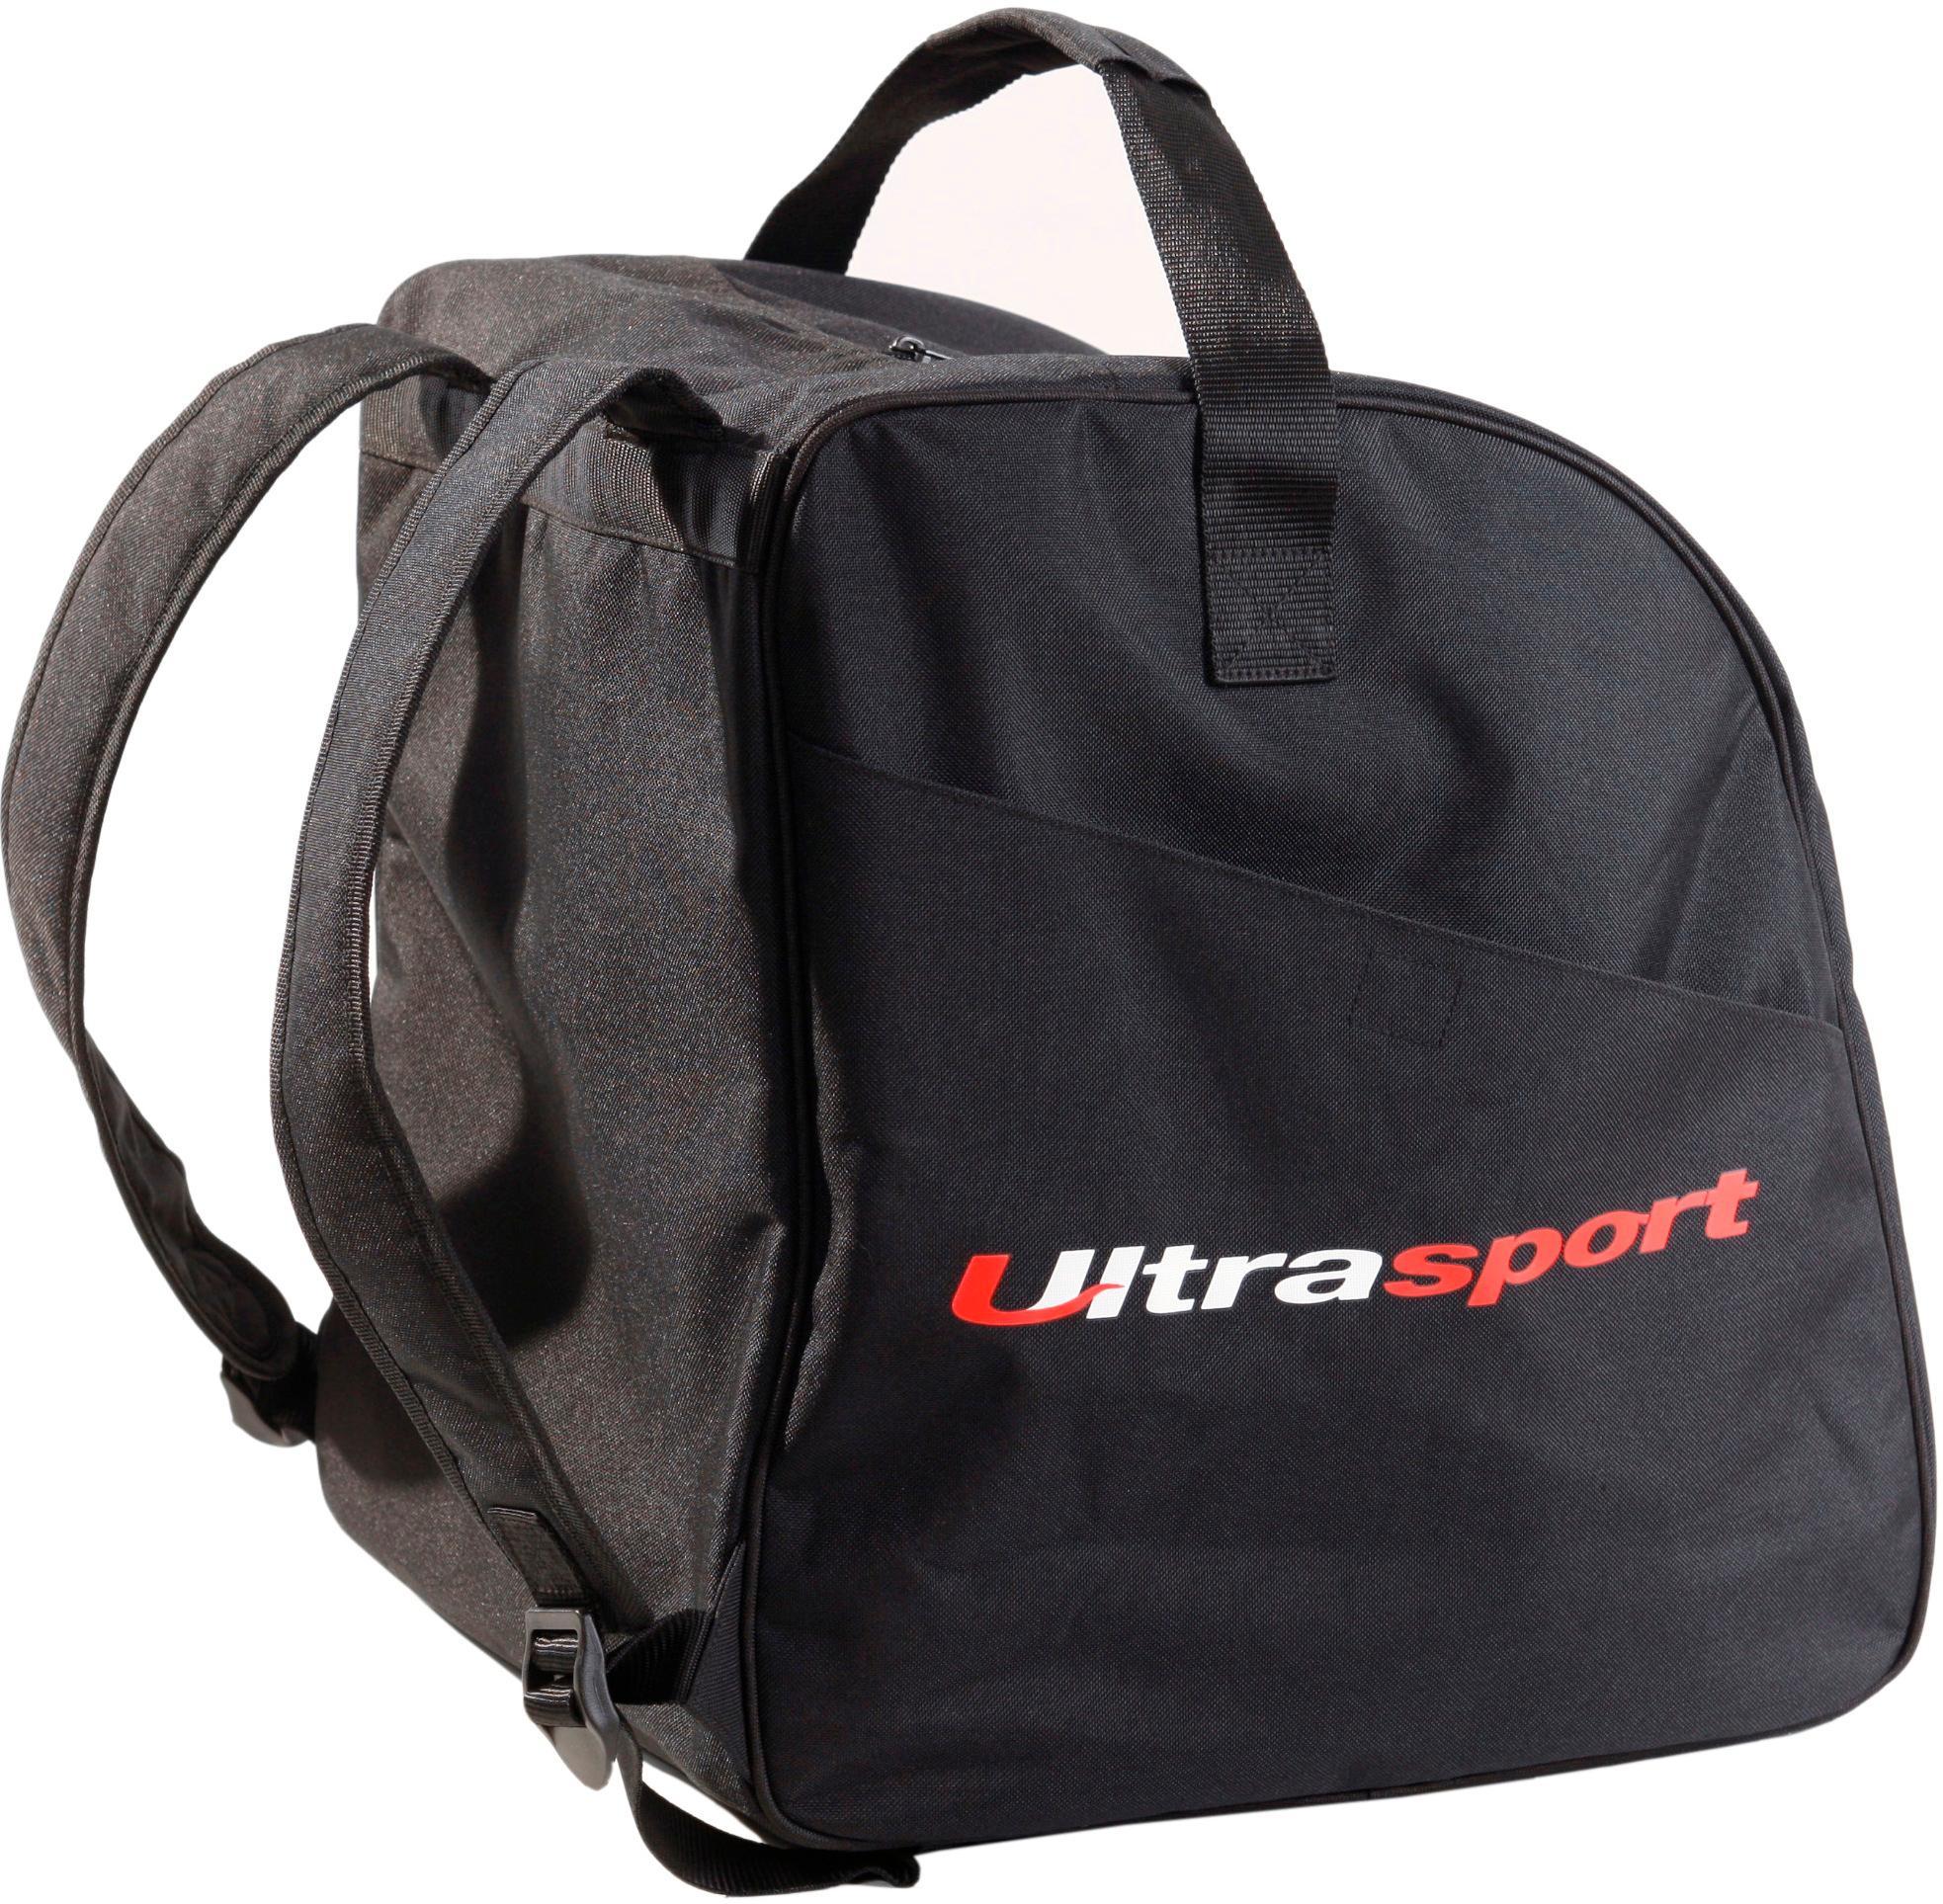 ultrasport sac chaussures de ski 2 en 1 avec poign e de transport et fonction sac dos. Black Bedroom Furniture Sets. Home Design Ideas